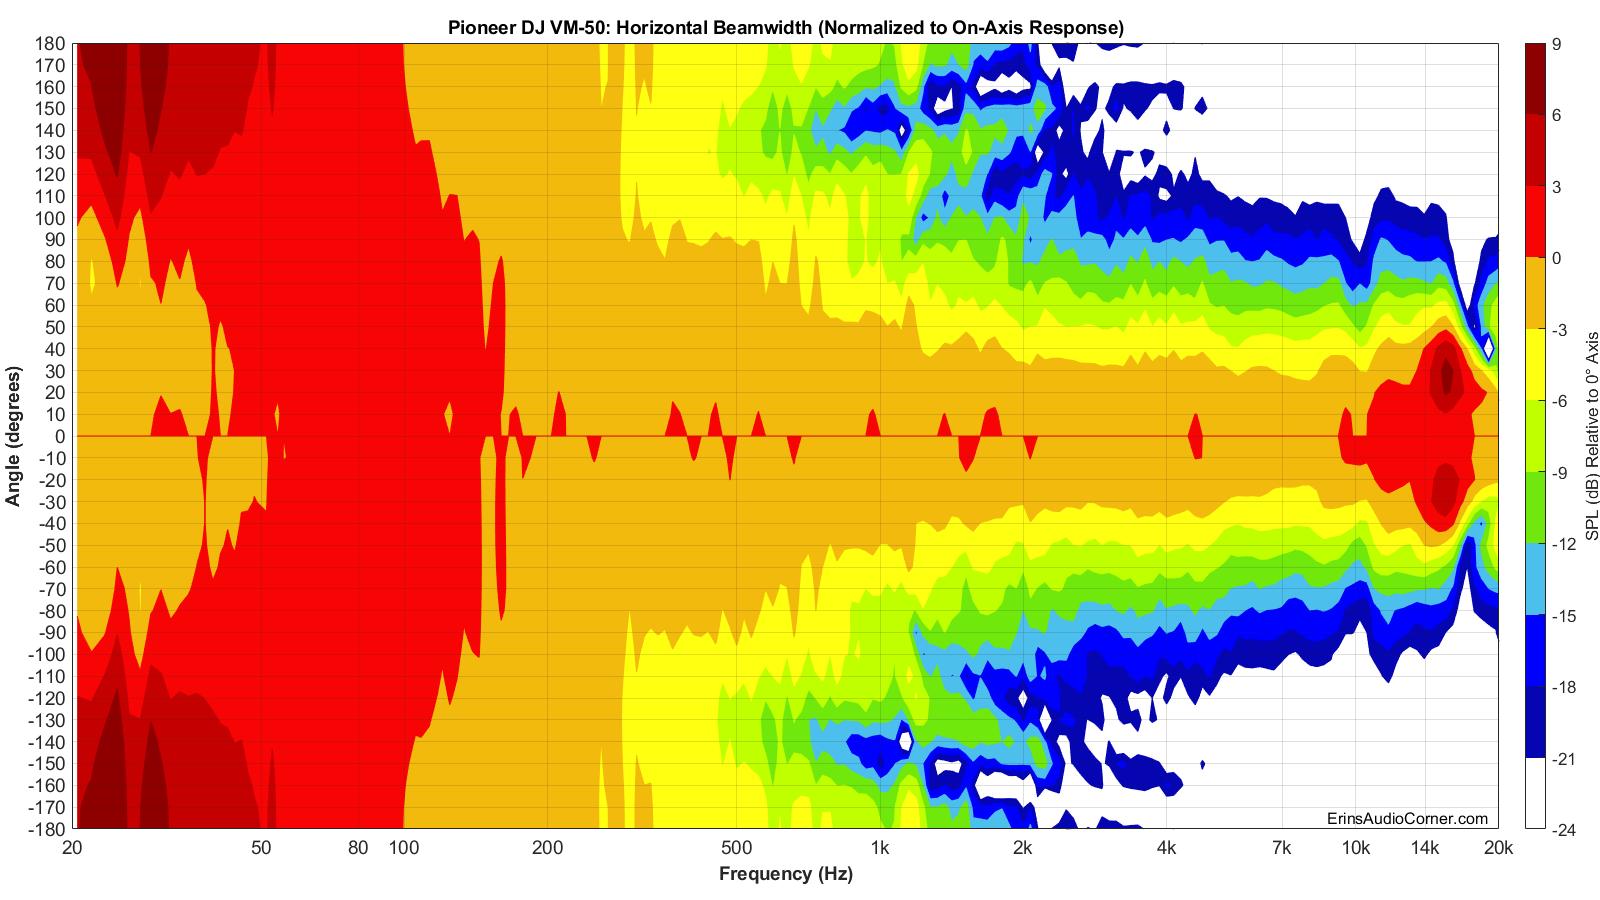 Pioneer%20DJ%20VM-50%20Beamwidth_Horizontal.png